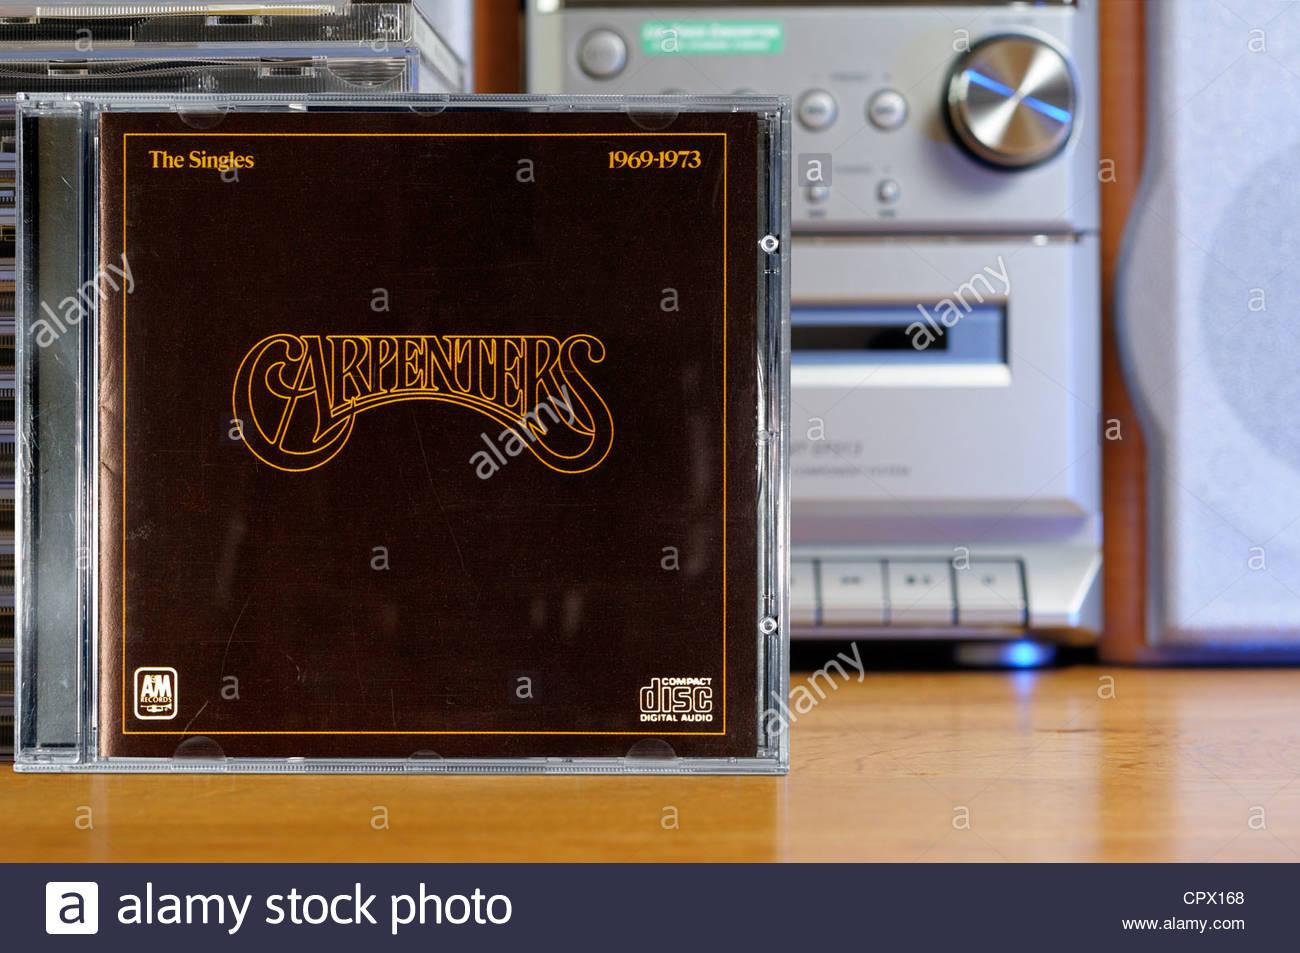 Carpenters album The Singles 1969-1973, piled music CD cases, England. Stock Photo